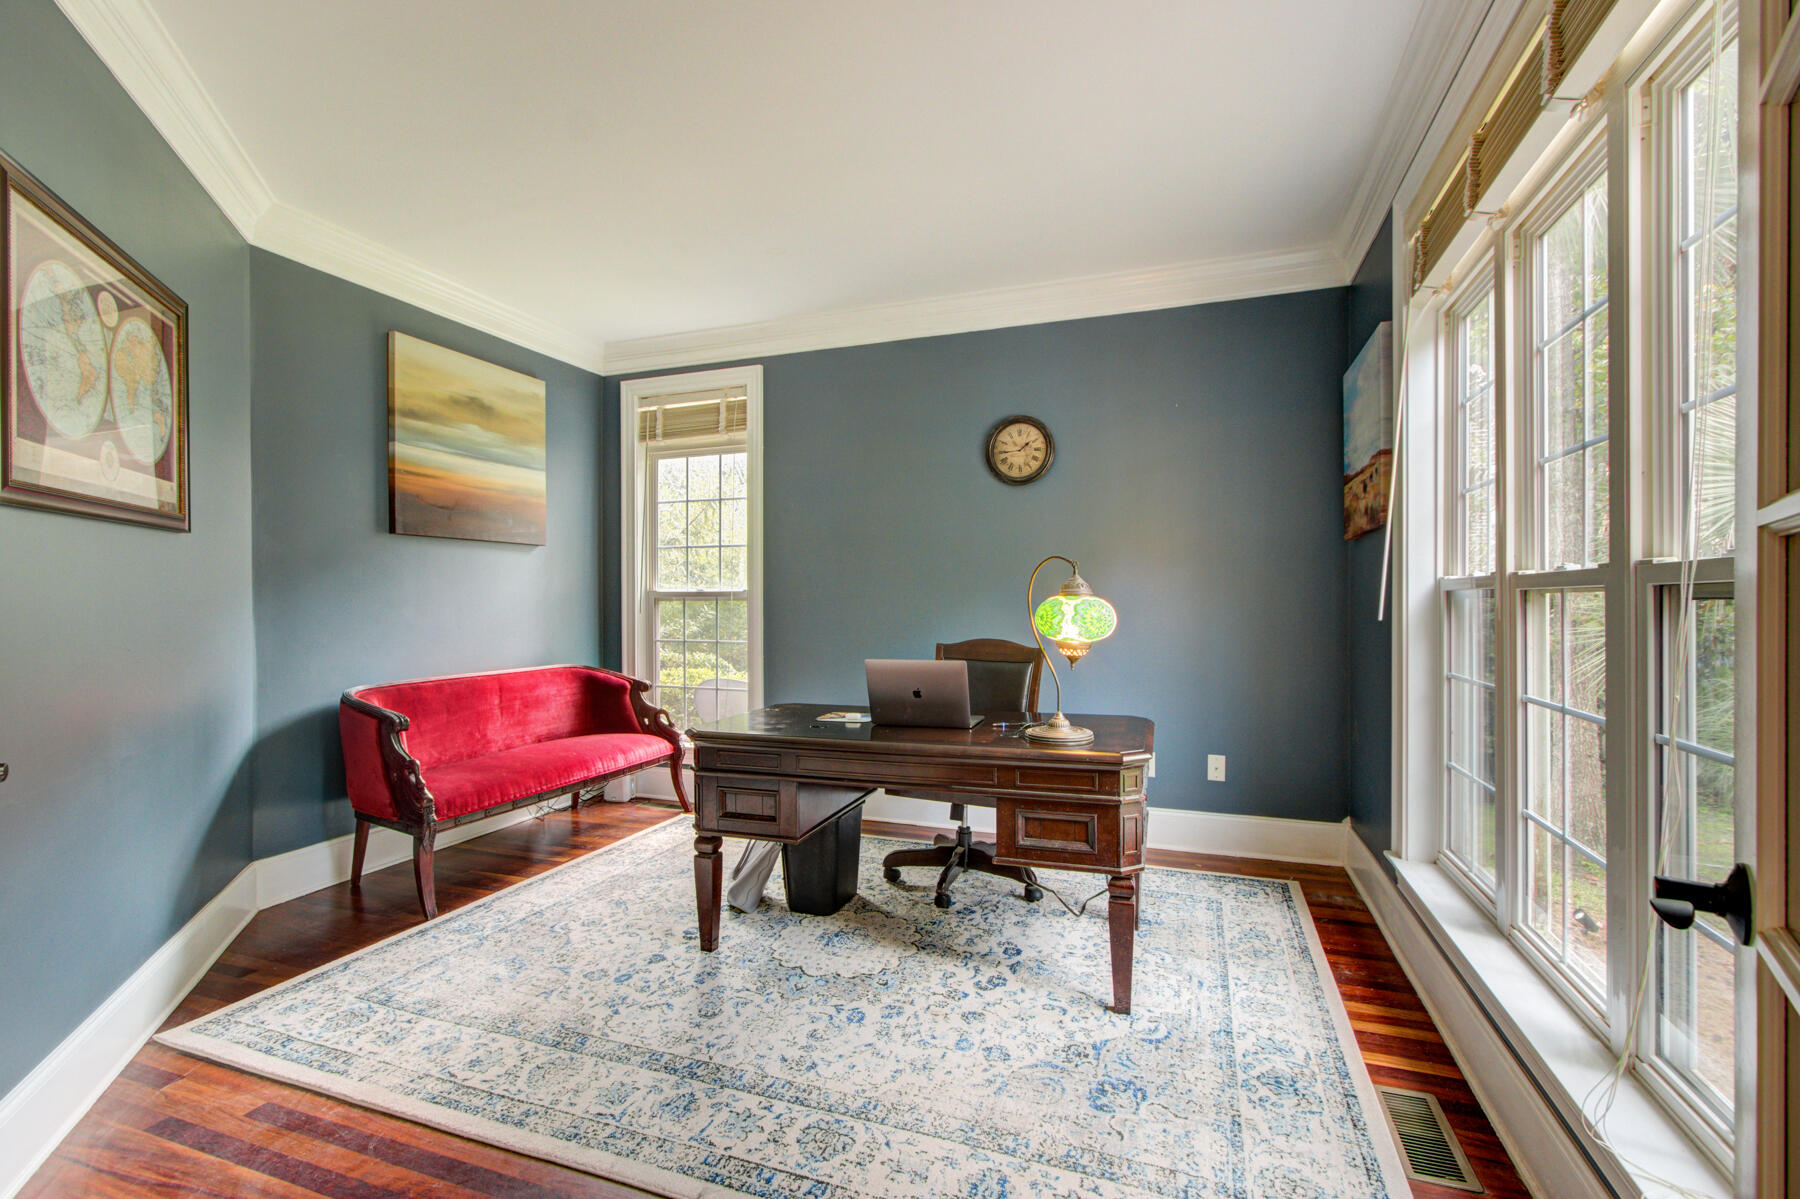 Dunes West Homes For Sale - 3095 Pignatelli, Mount Pleasant, SC - 28